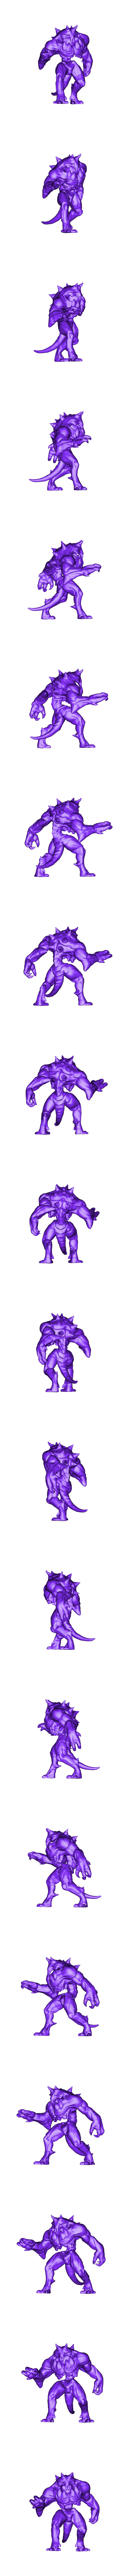 Golem_A1_pose_1.stl Download free OBJ file D&D Golem miniature - pose 1 • 3D printer model, SimonAublet